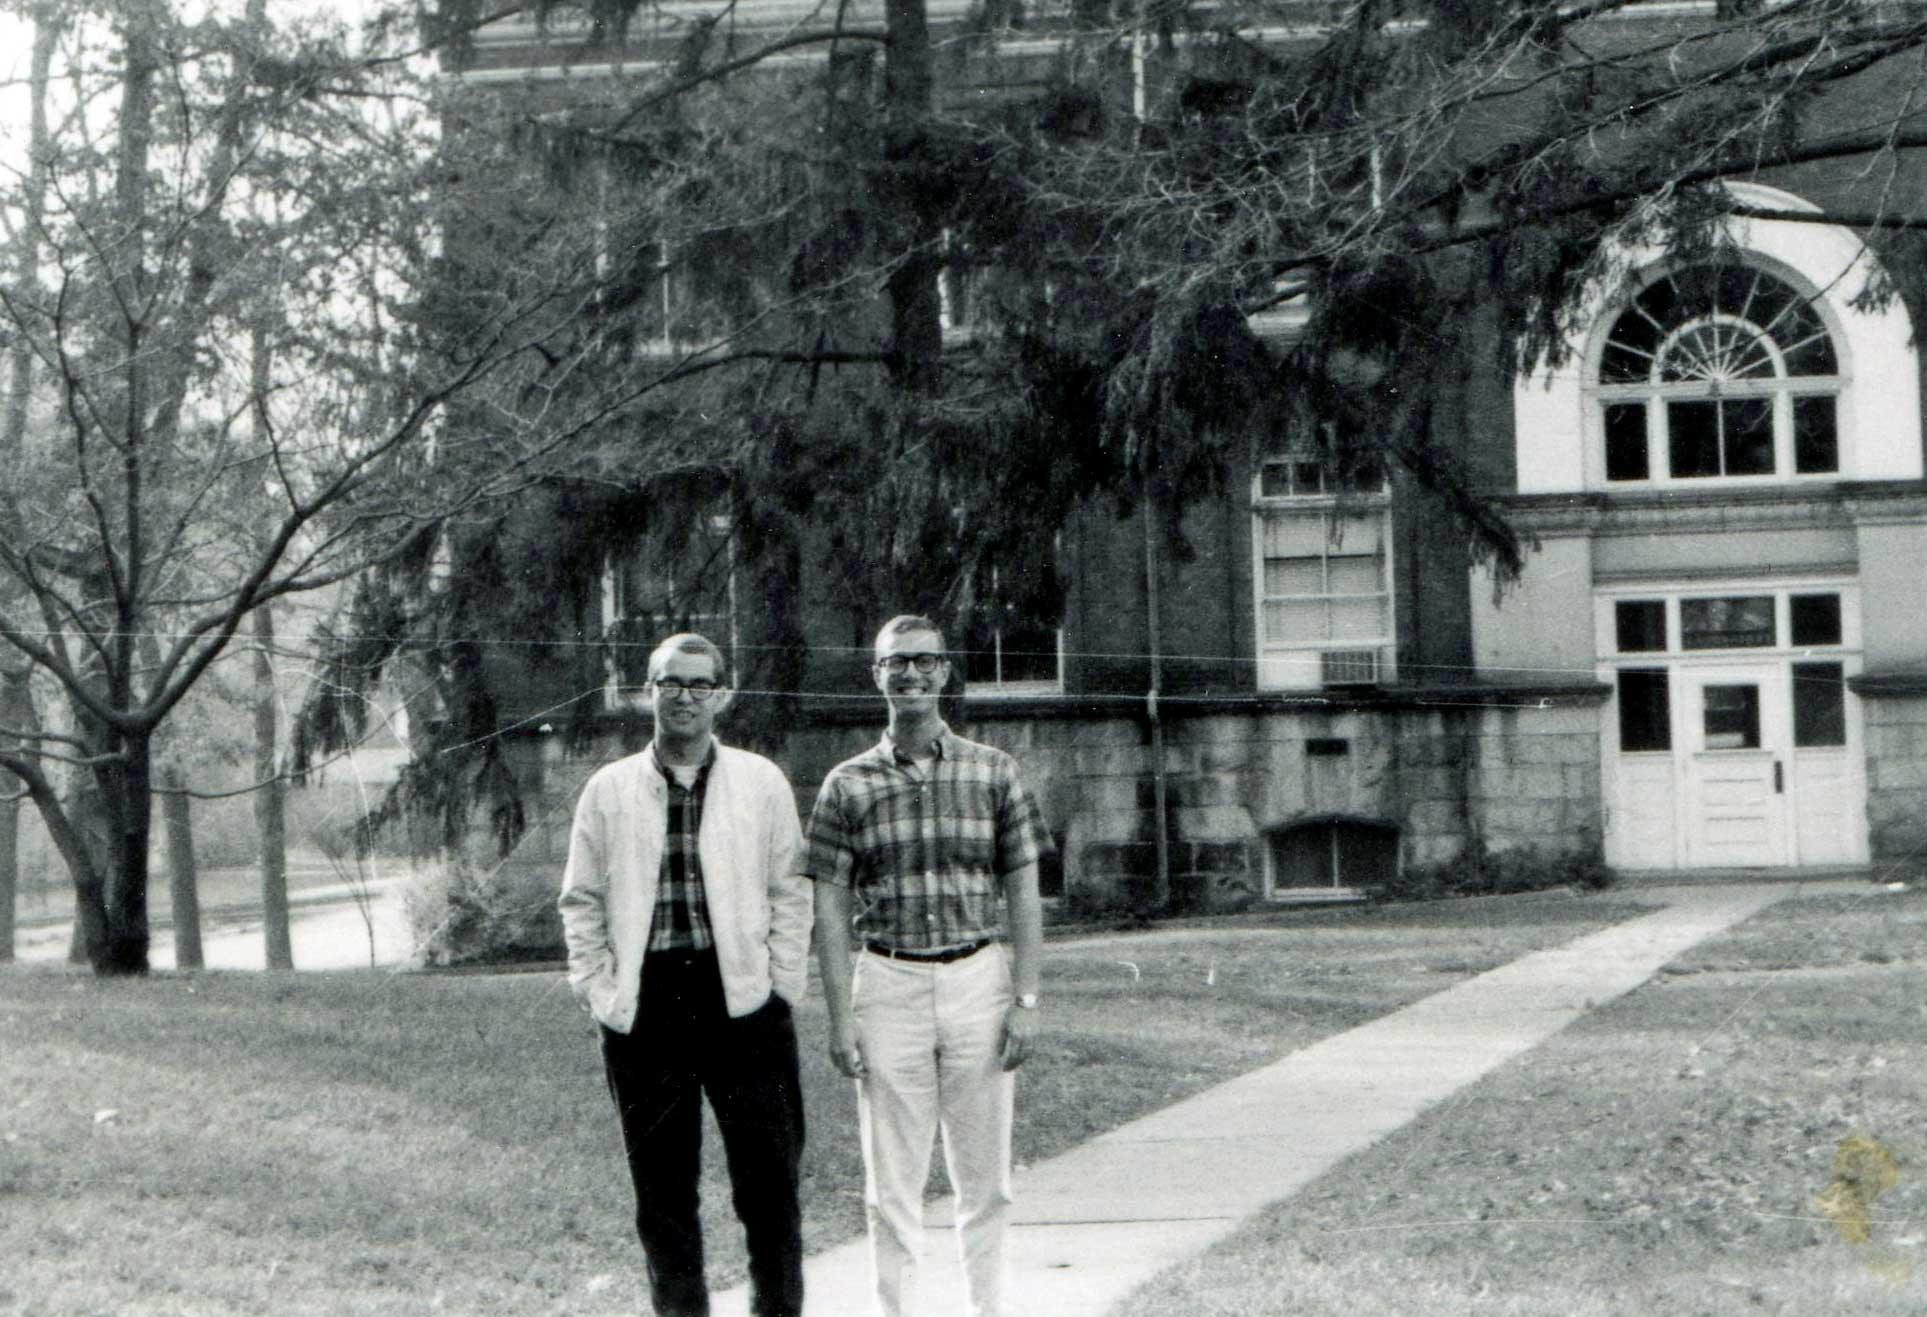 Albion, MI, 1962